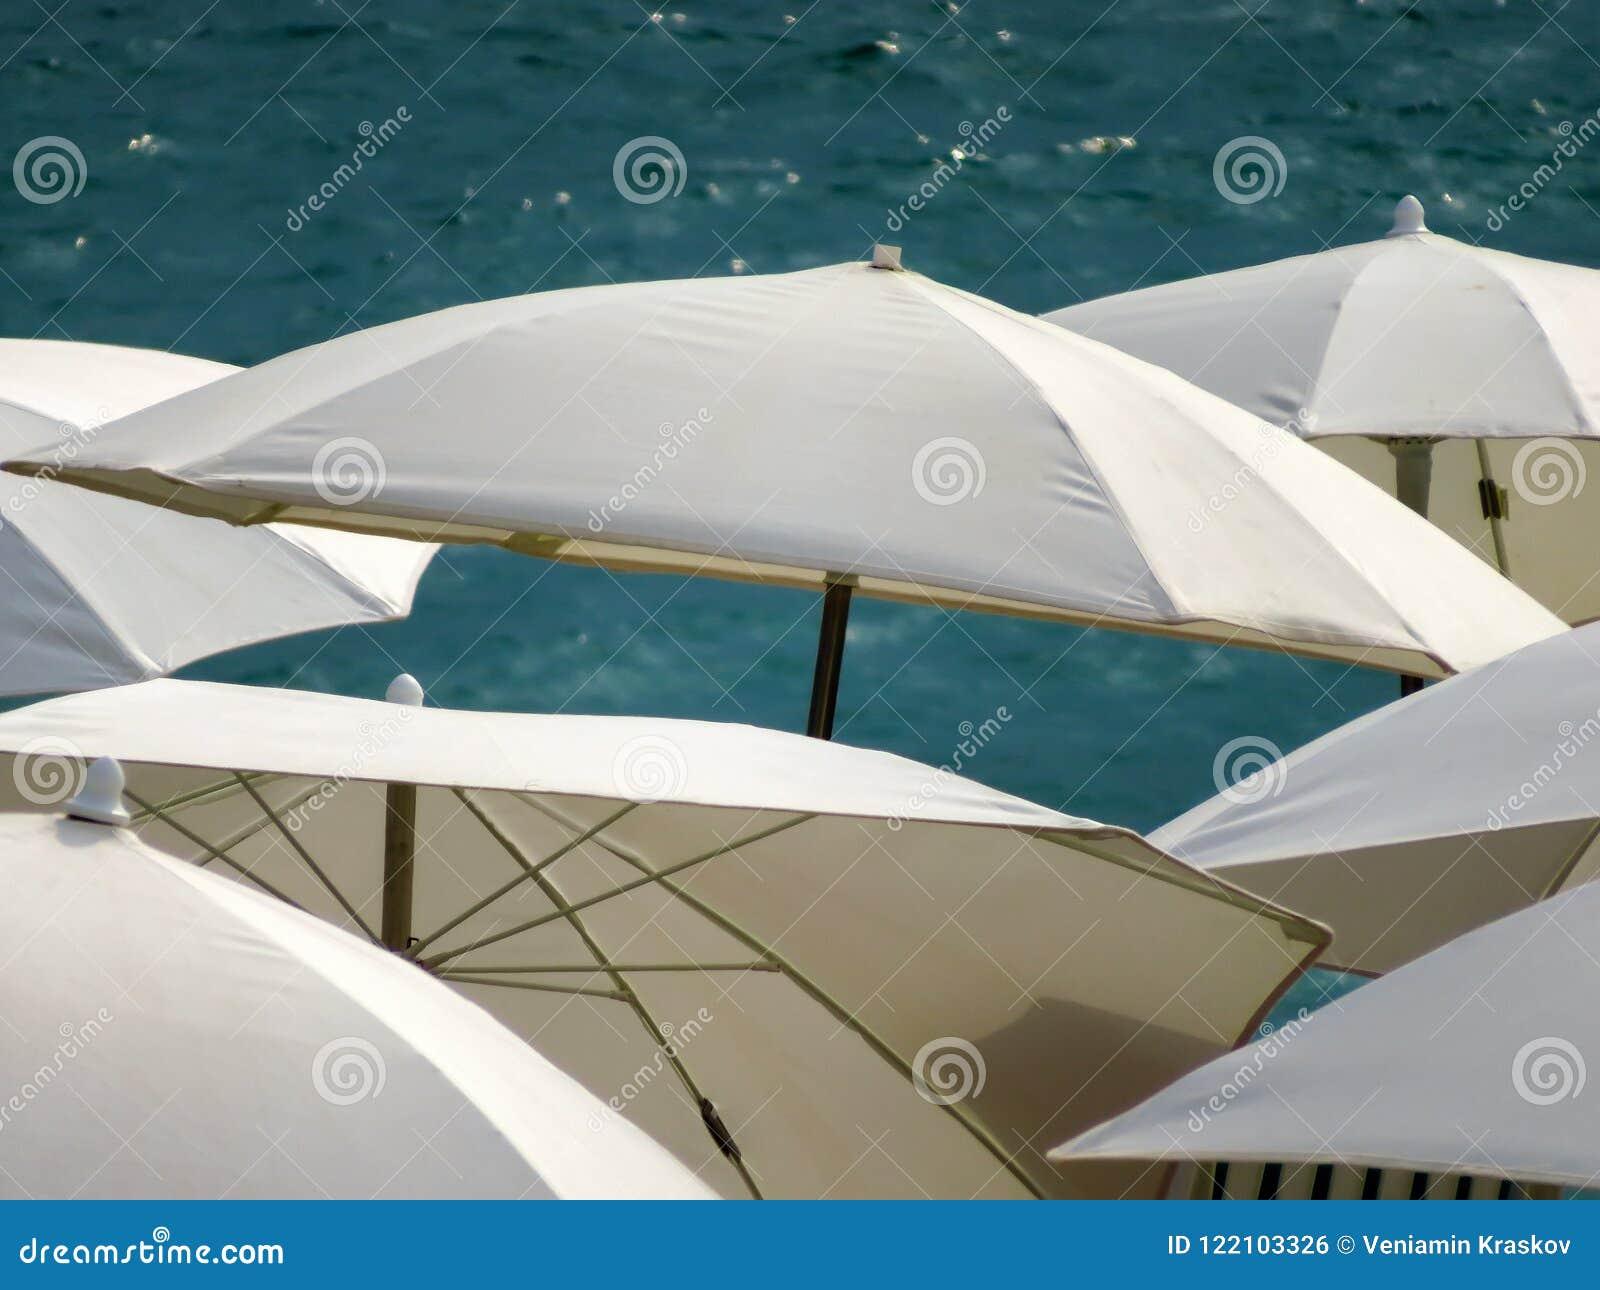 Канн - белые зонтики на пляже